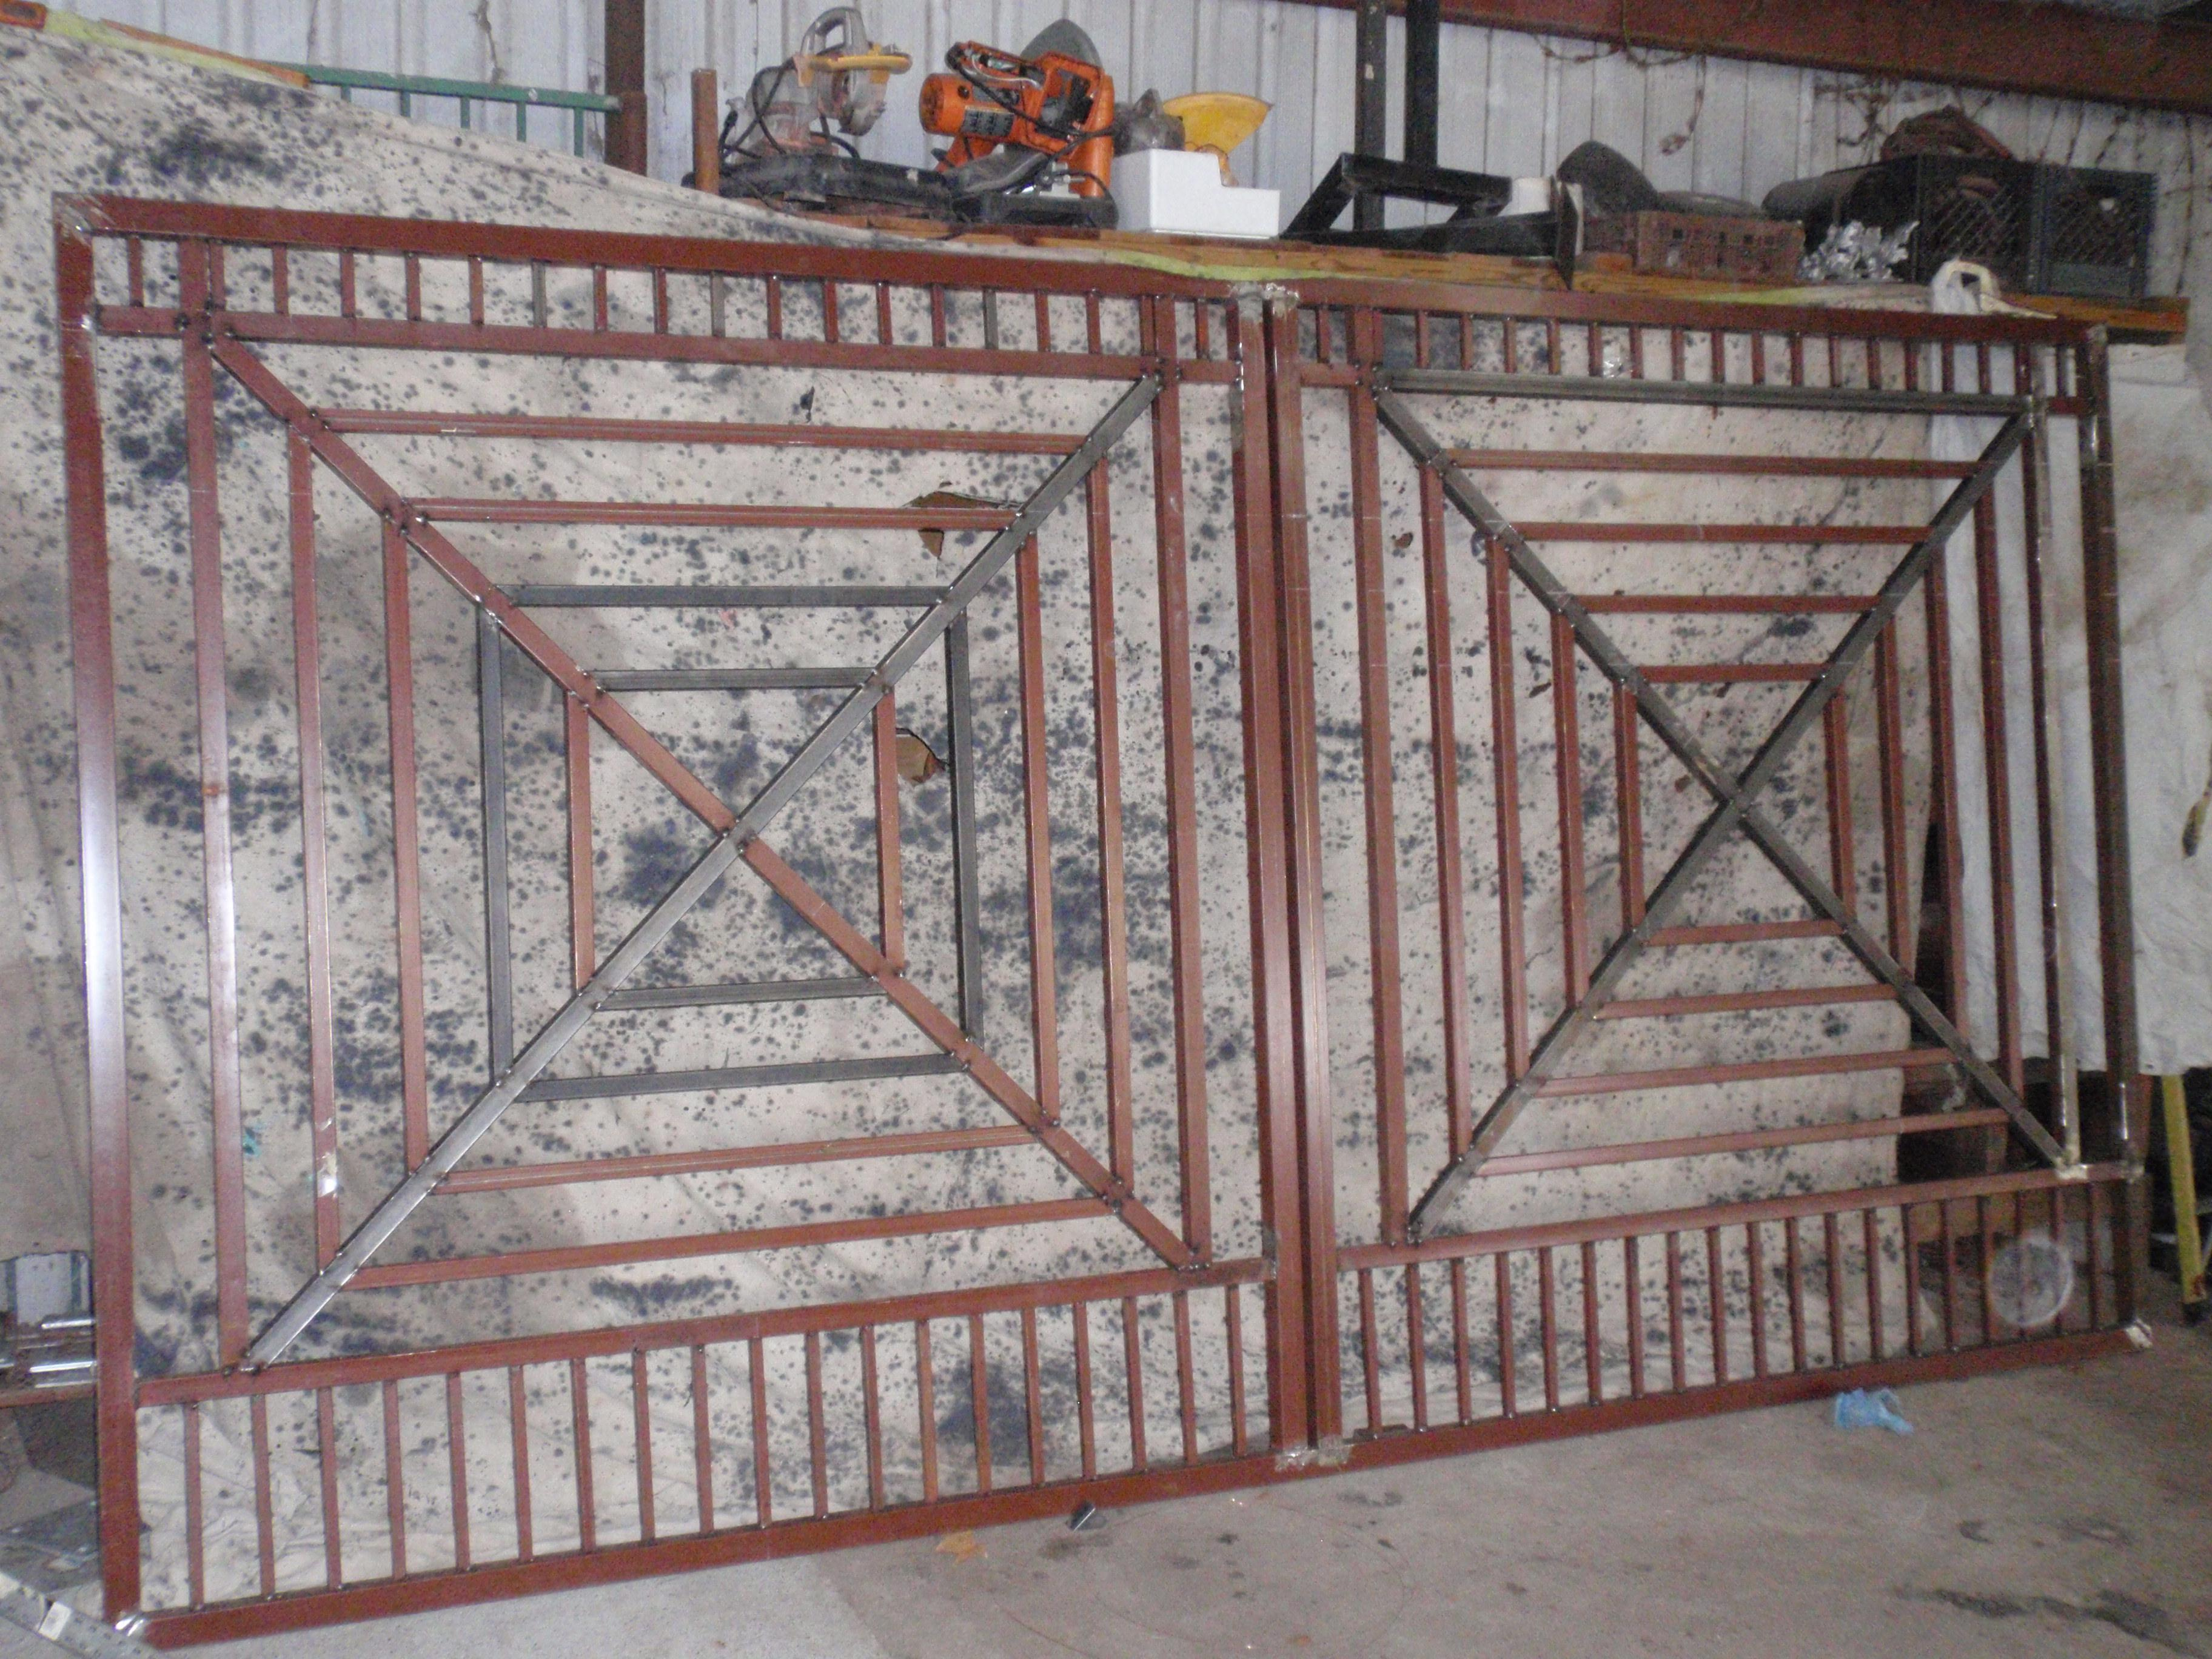 Tejas Fence & Iron Works, Inc image 24